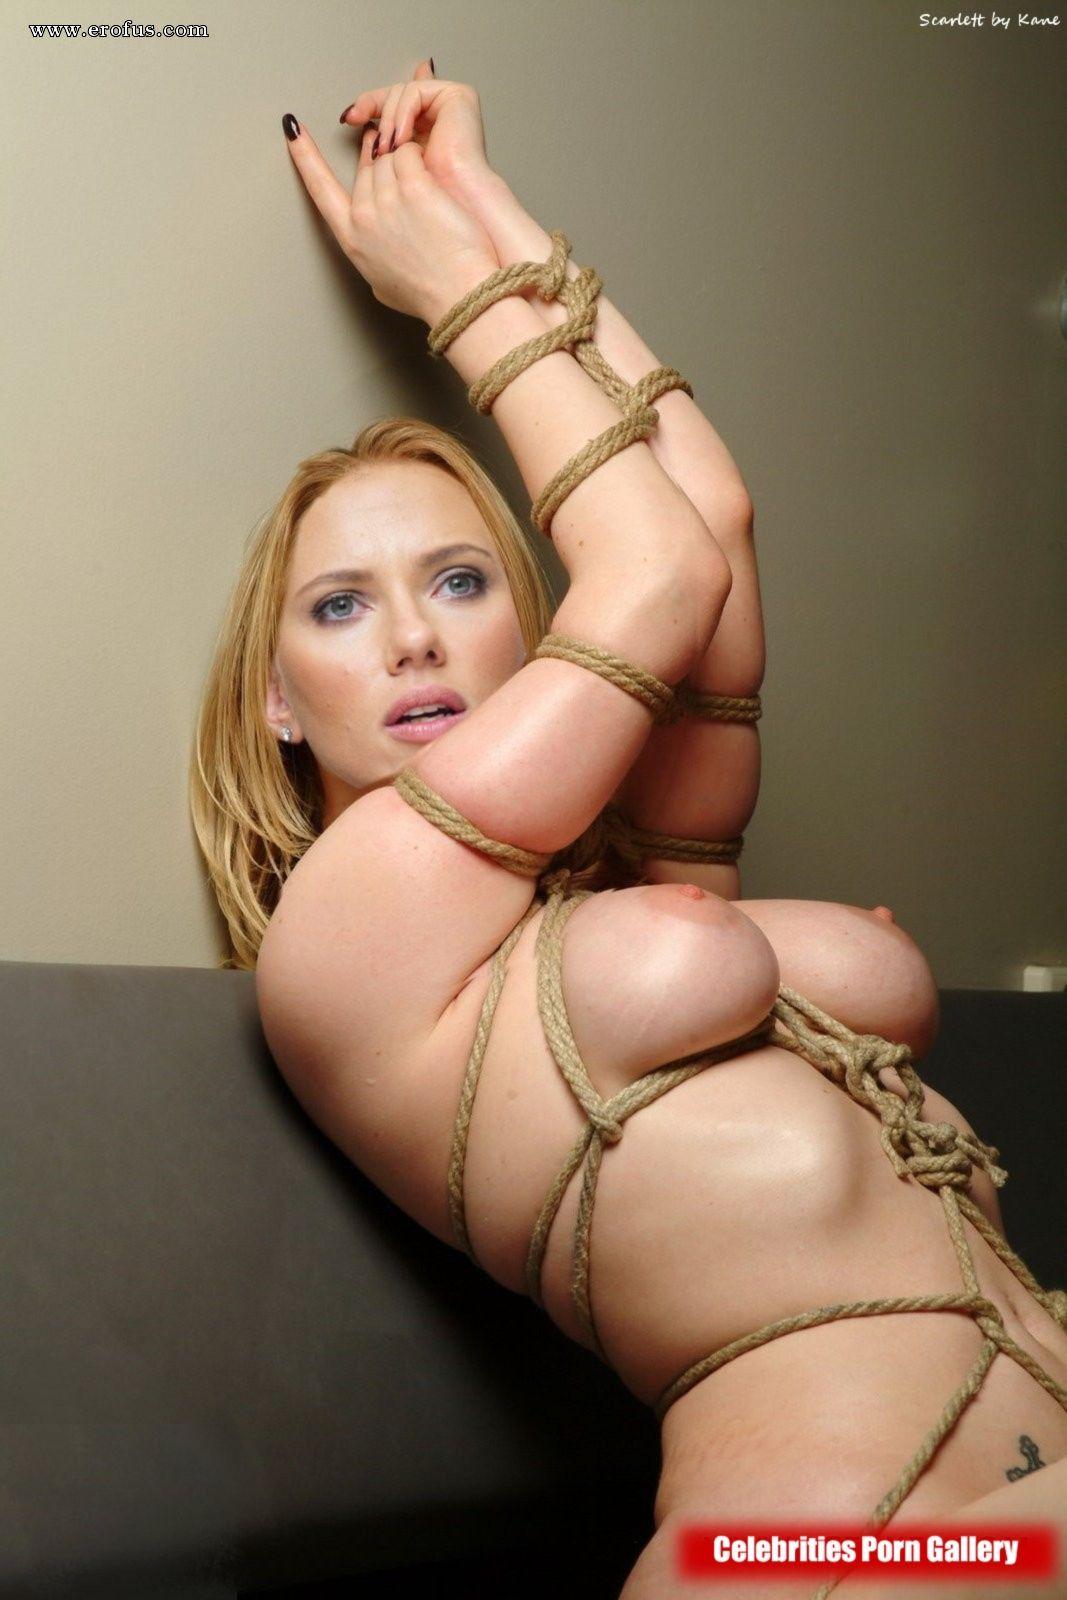 Fake Celebrities Sex Pictures · Scarlett Johansson · 43.jpg · 43.jpg